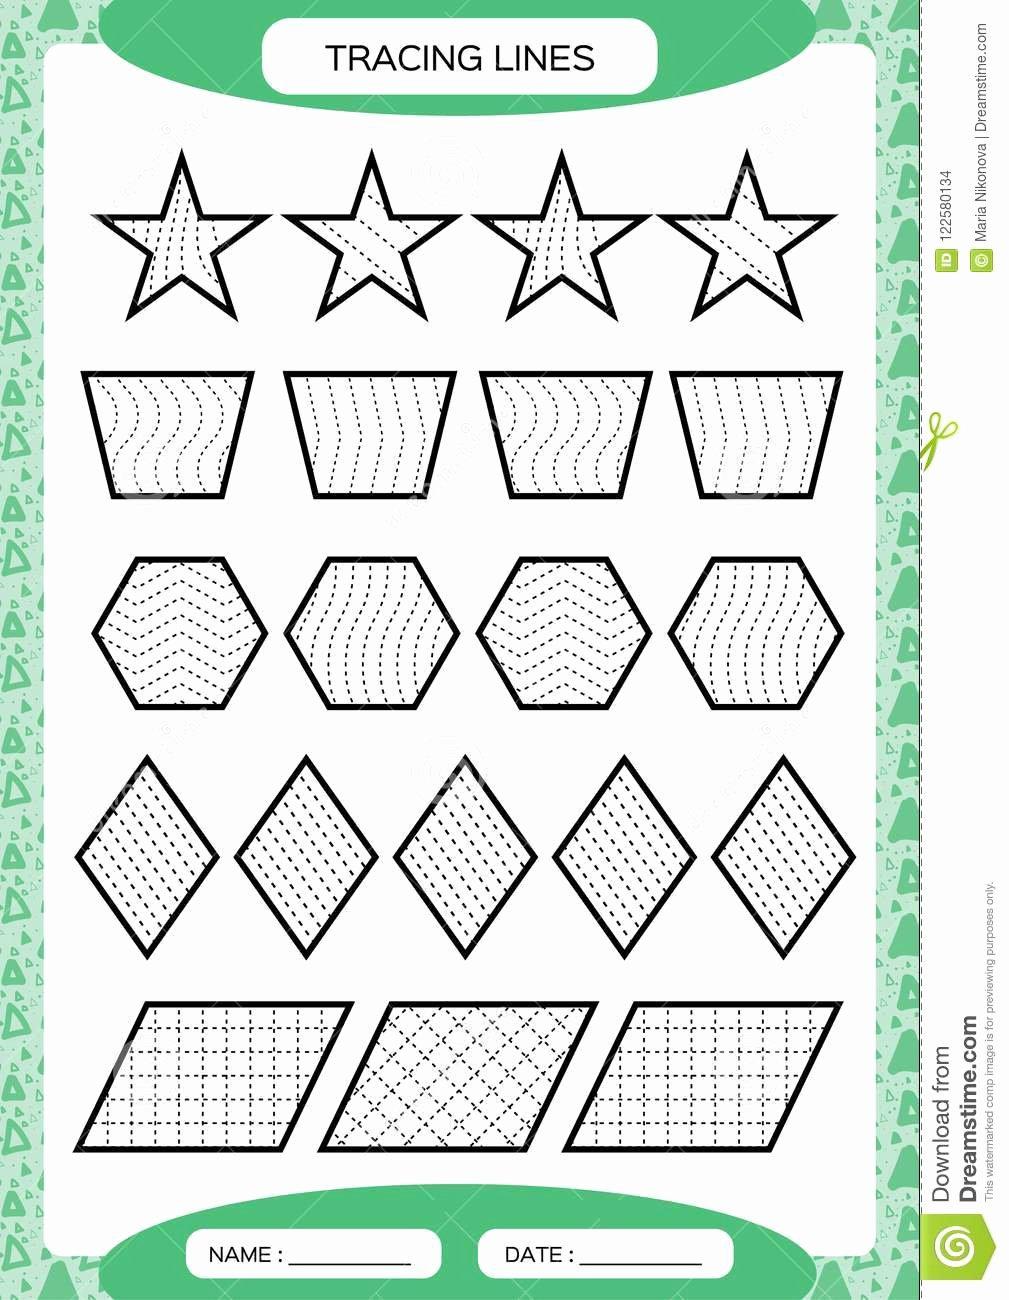 Fine Motor Skills Worksheets for Preschoolers New Tracing Lines Kids Education Preschool Worksheet Basic